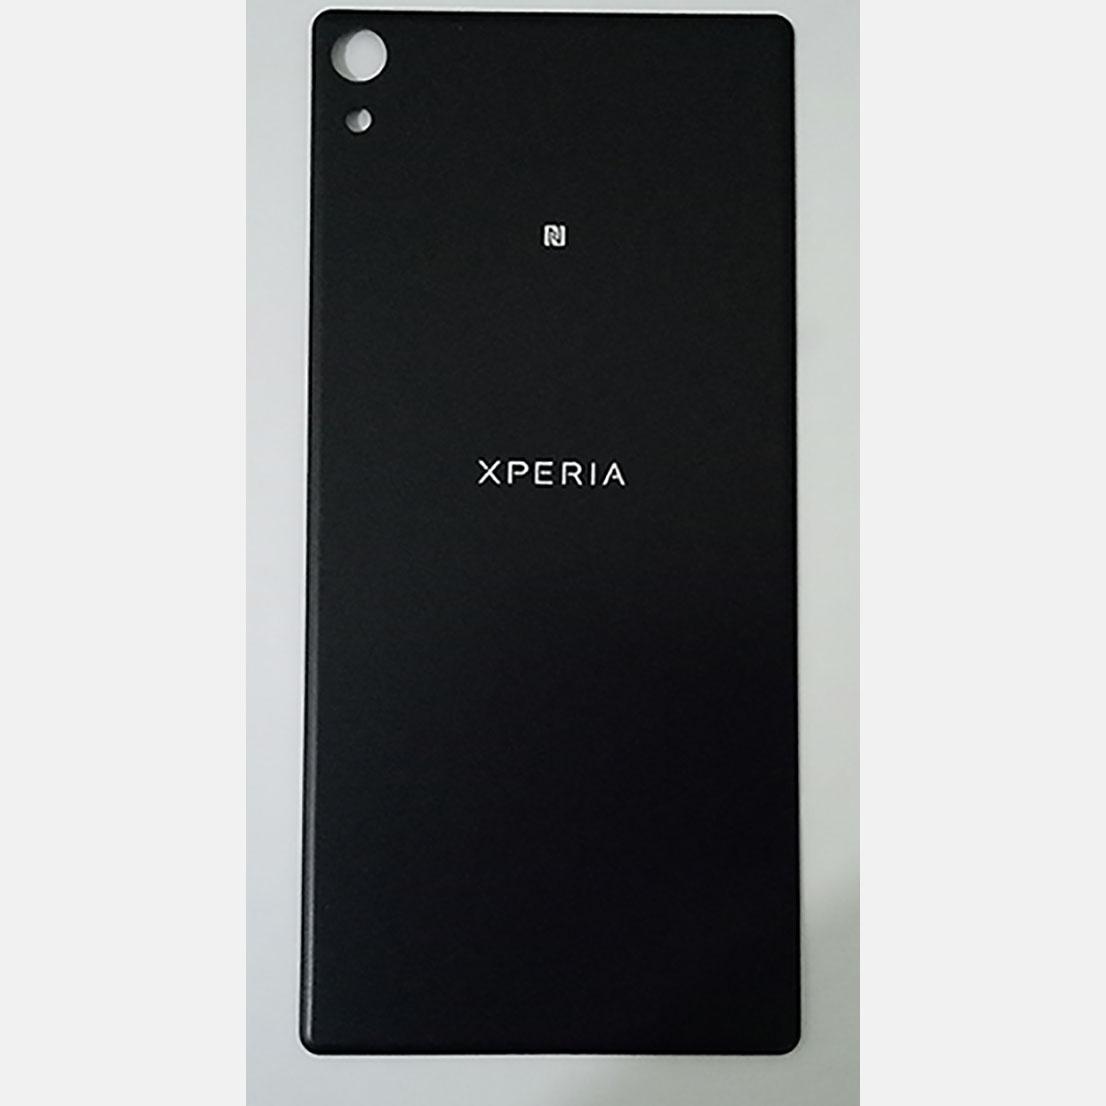 Sony Xperia XA / F3115 - 5.0 inch - Back Cover Case / Penutup Belakang -